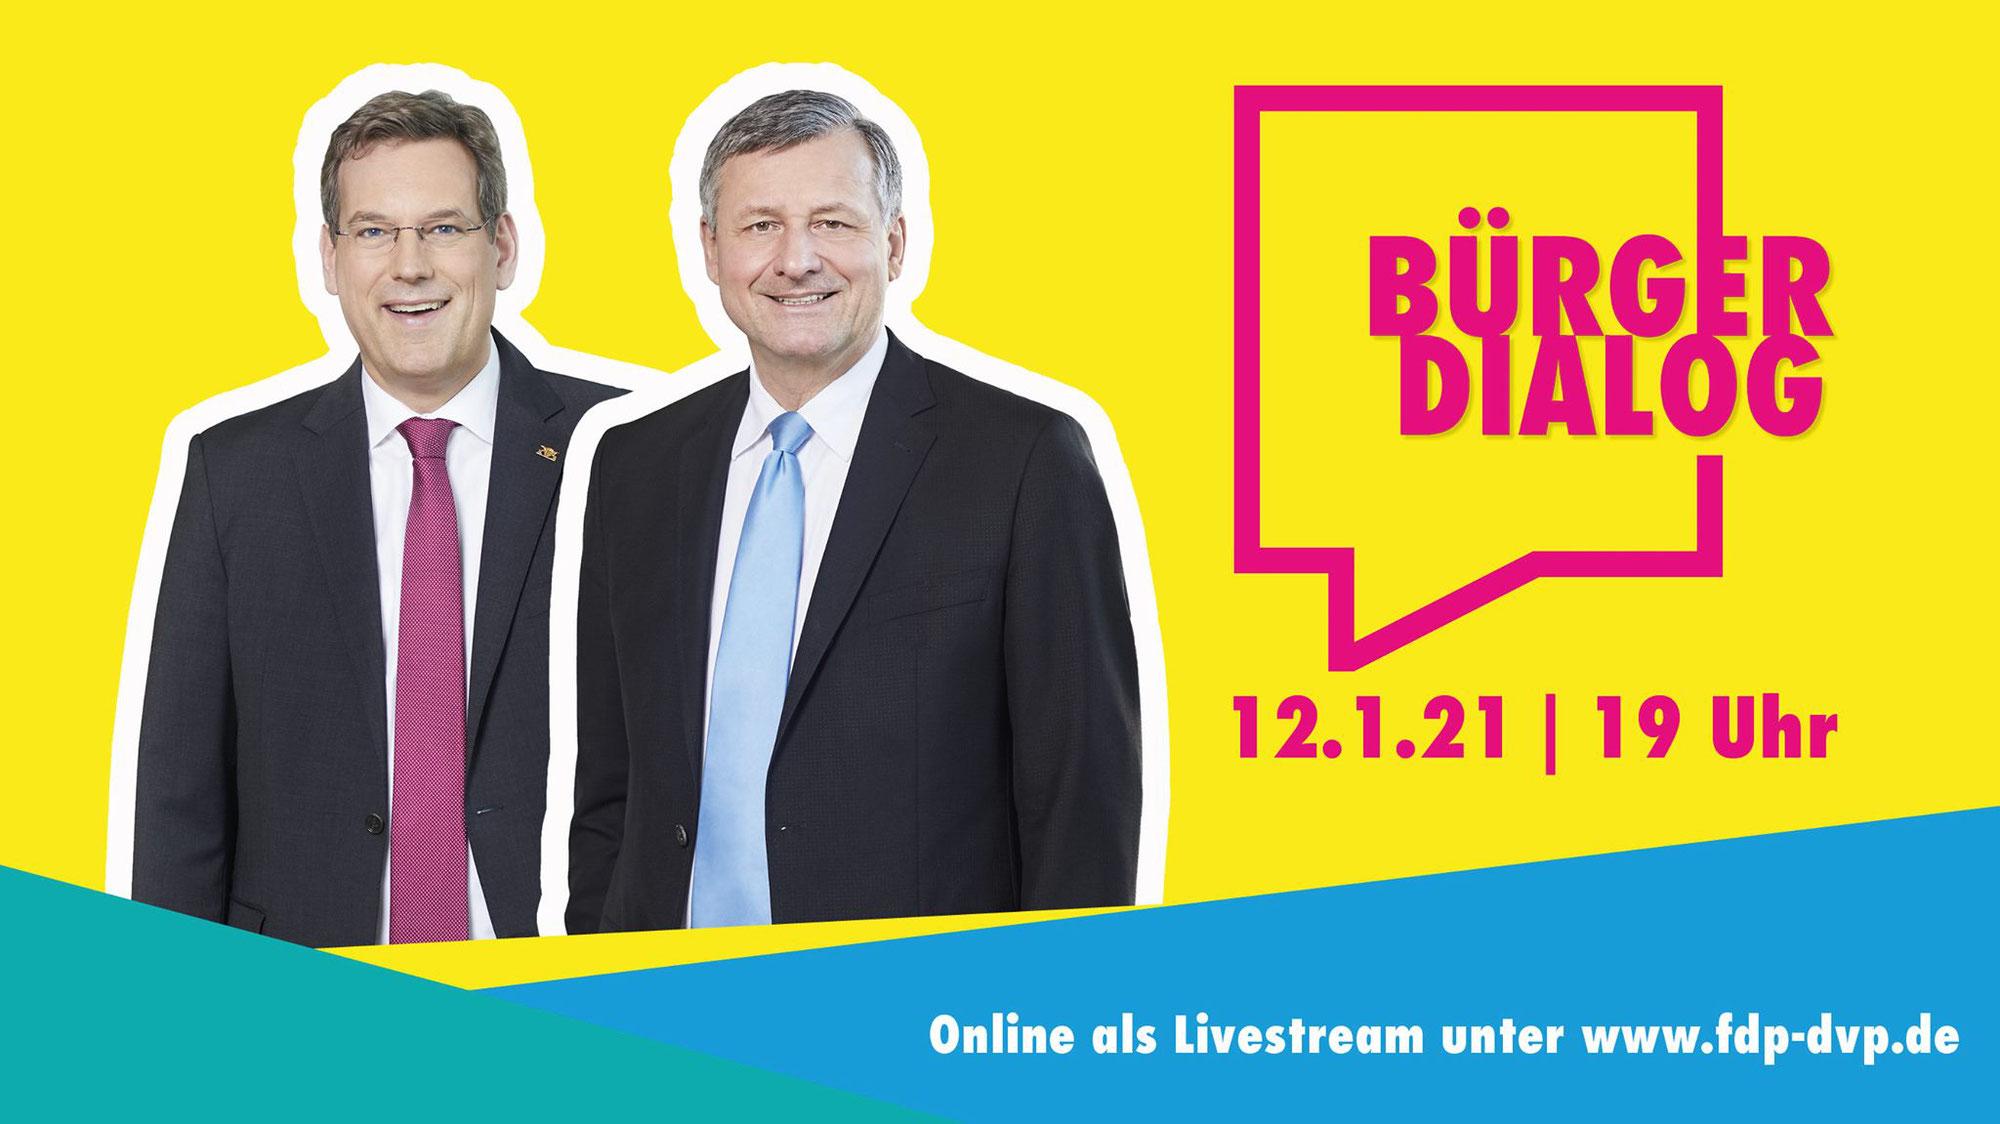 Bürgerdialog der FDP/DVP-Fraktion aus Pforzheim